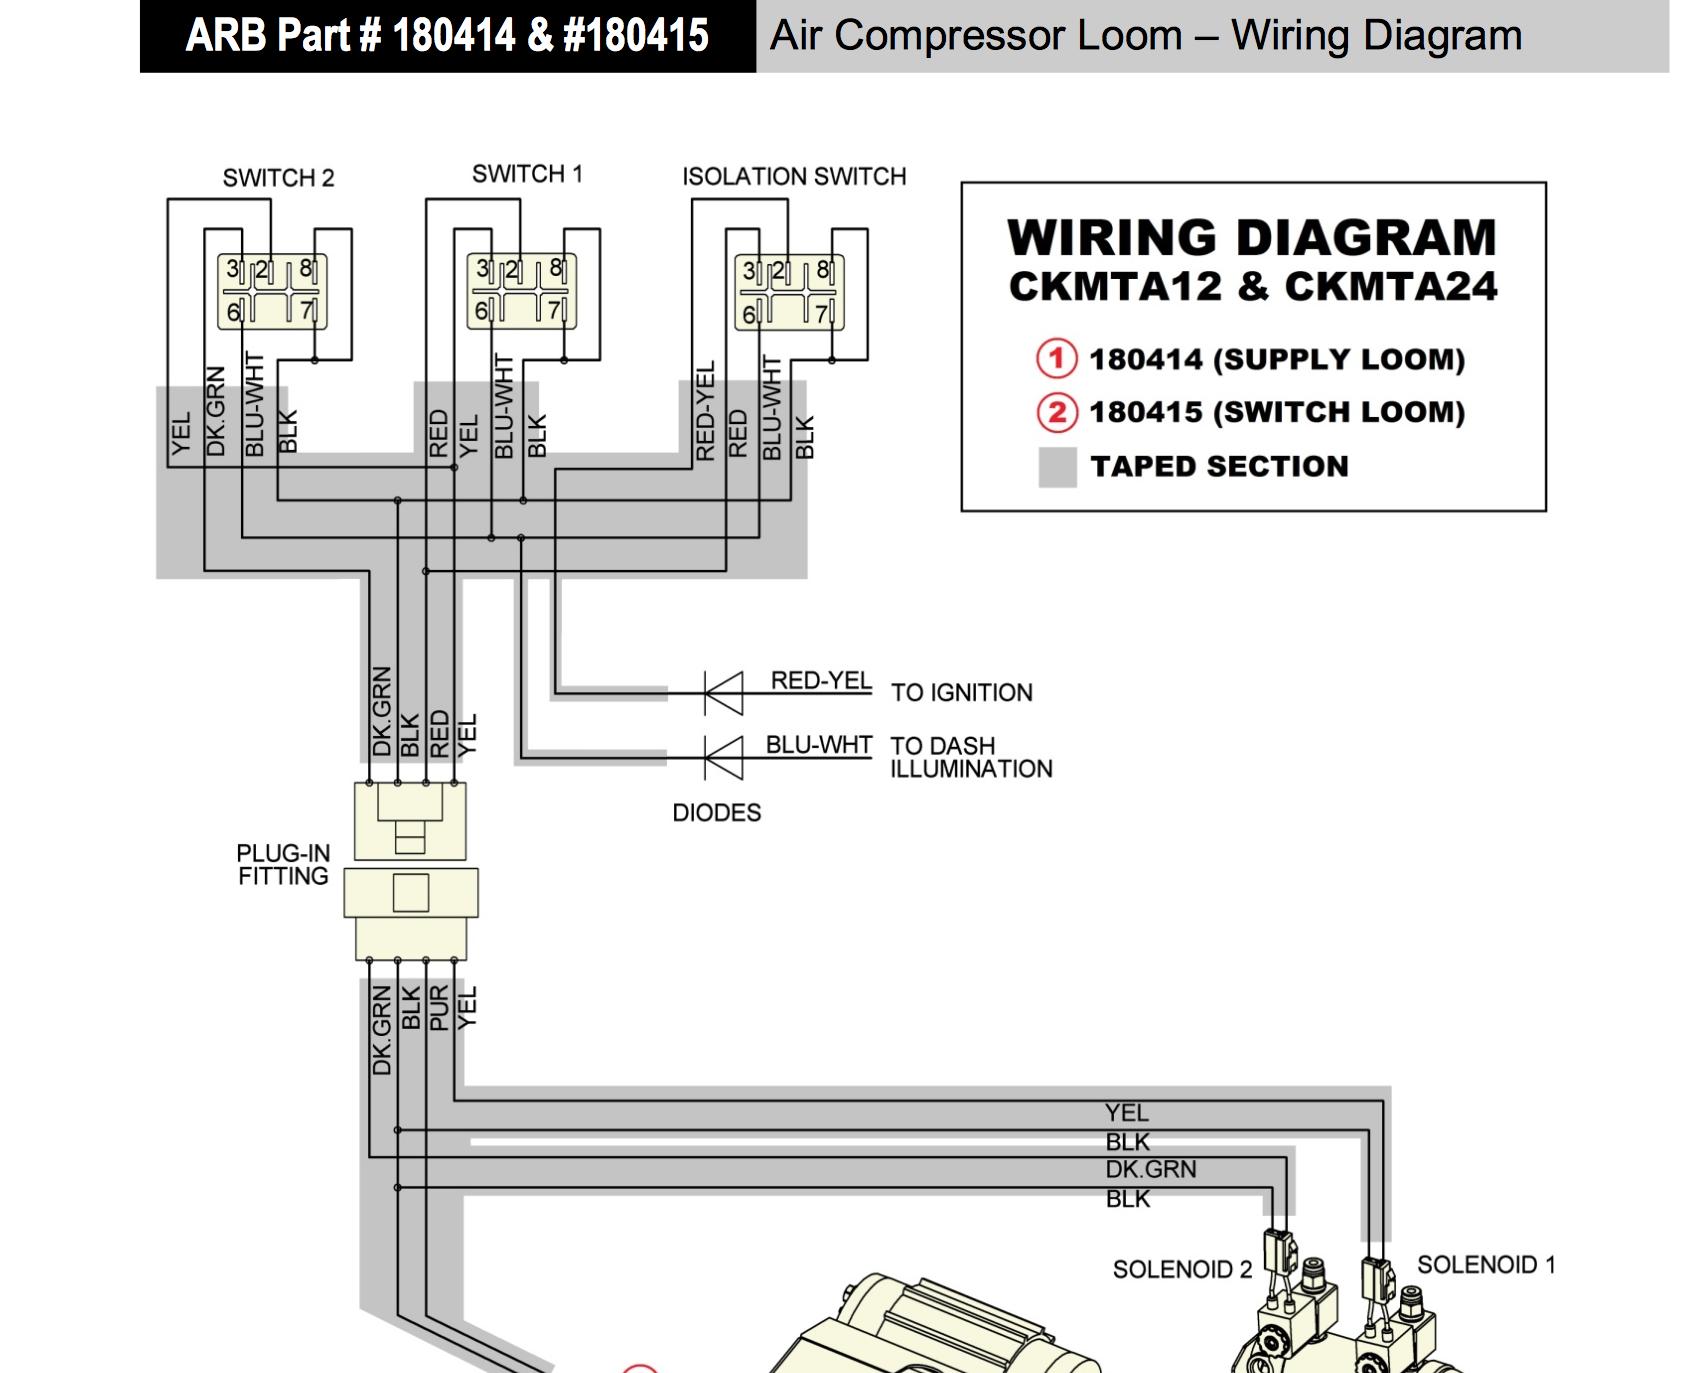 [NRIO_4796]   Arb Air Compressor Wiring Diagram - Led Tail Light Wiring Diagram 07  Polaris for Wiring Diagram Schematics | Arb Compressor Wiring Diagram |  | Wiring Diagram Schematics